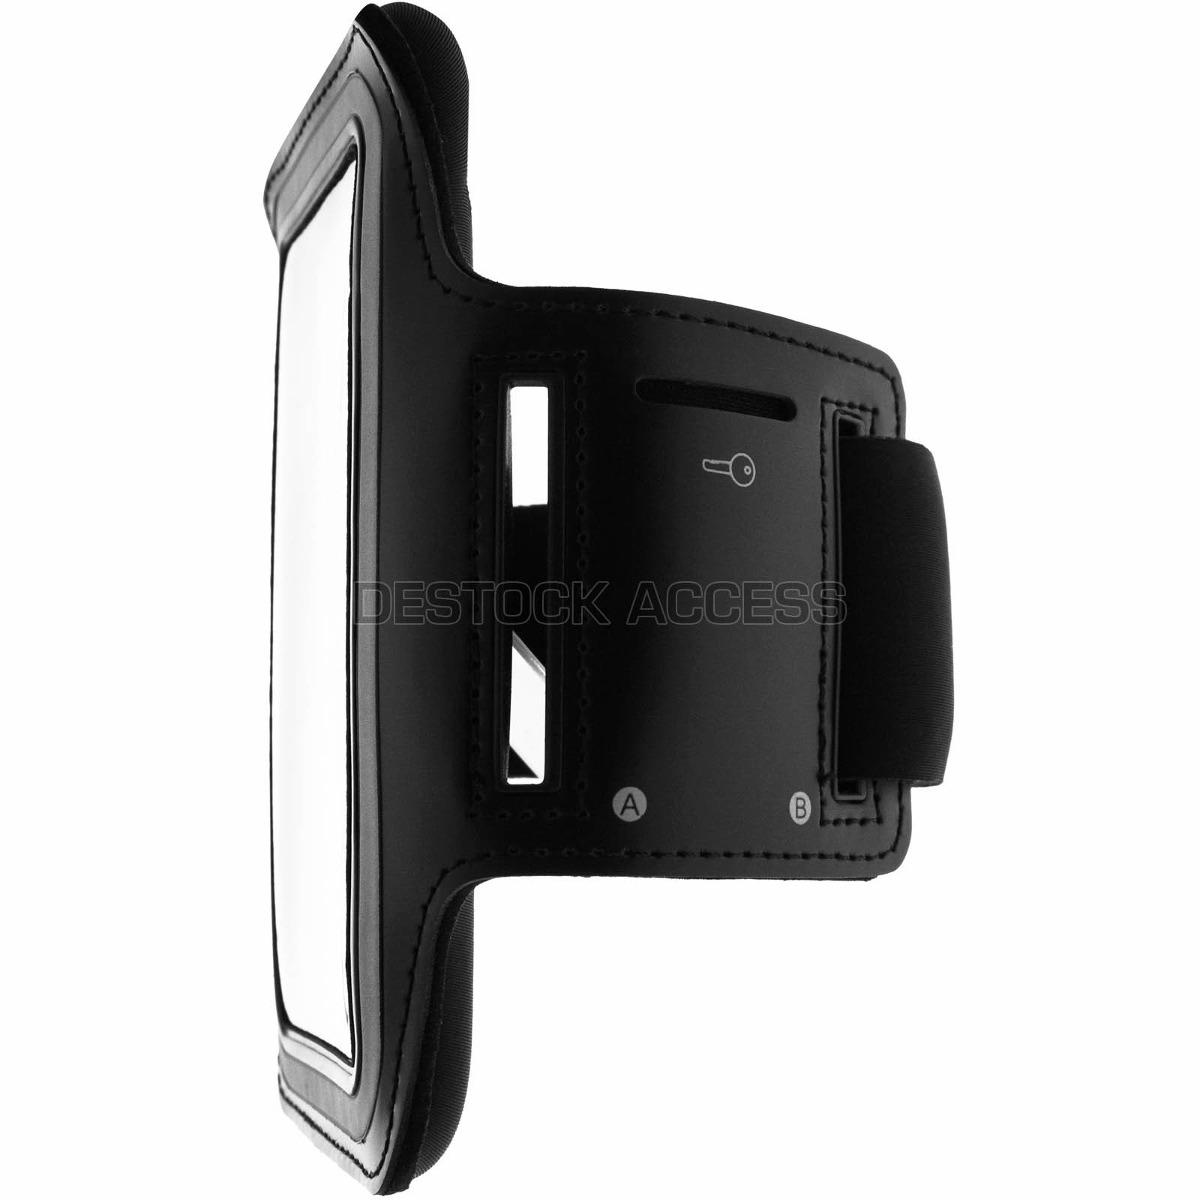 Bracadeira Armband Esport Asus Zenfone 2 Laser Ze550kl Top